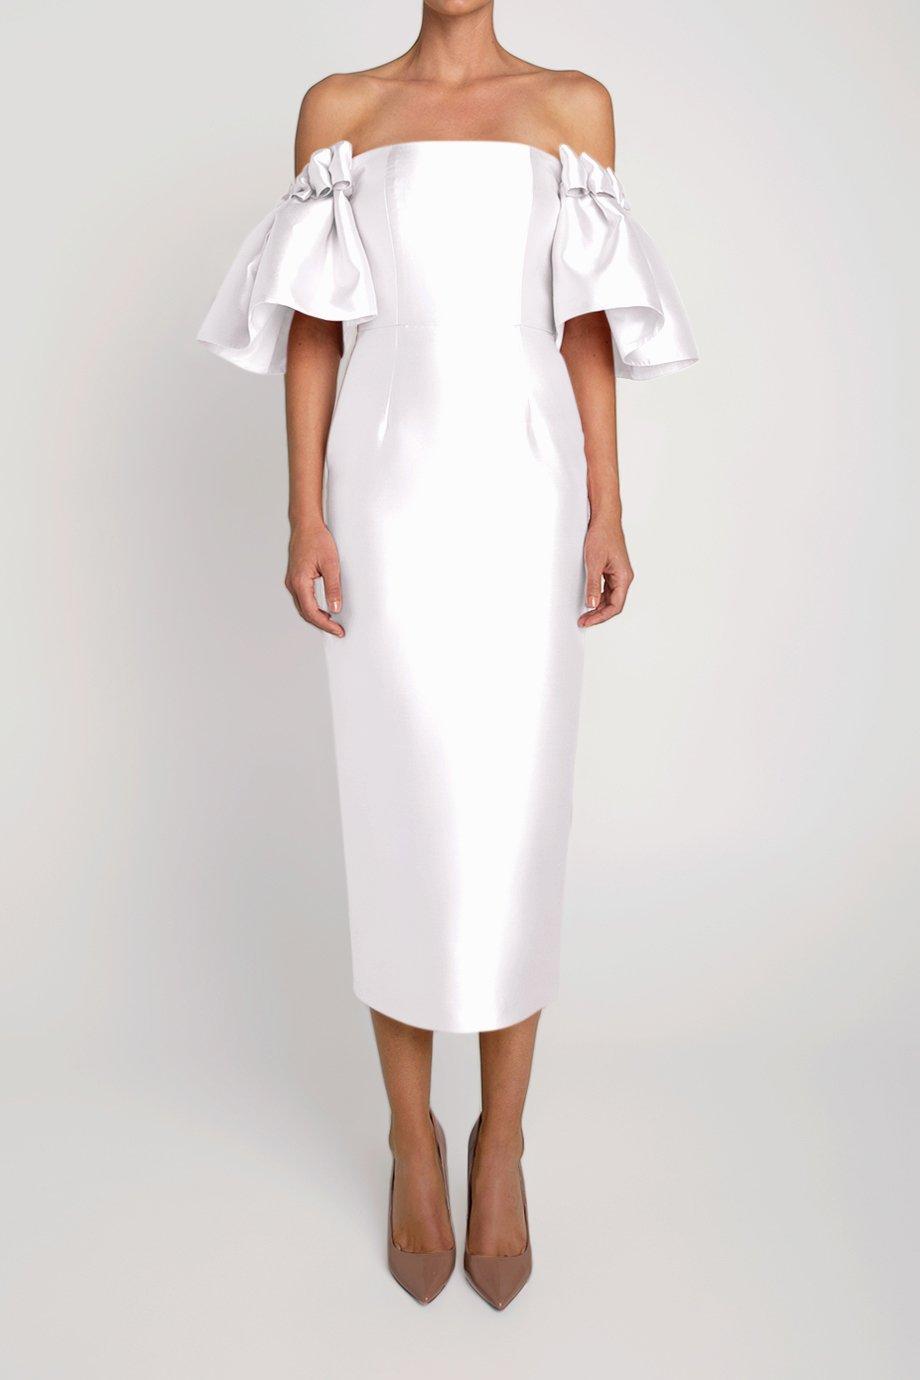 Poppy Silk and Wool Midi Dress